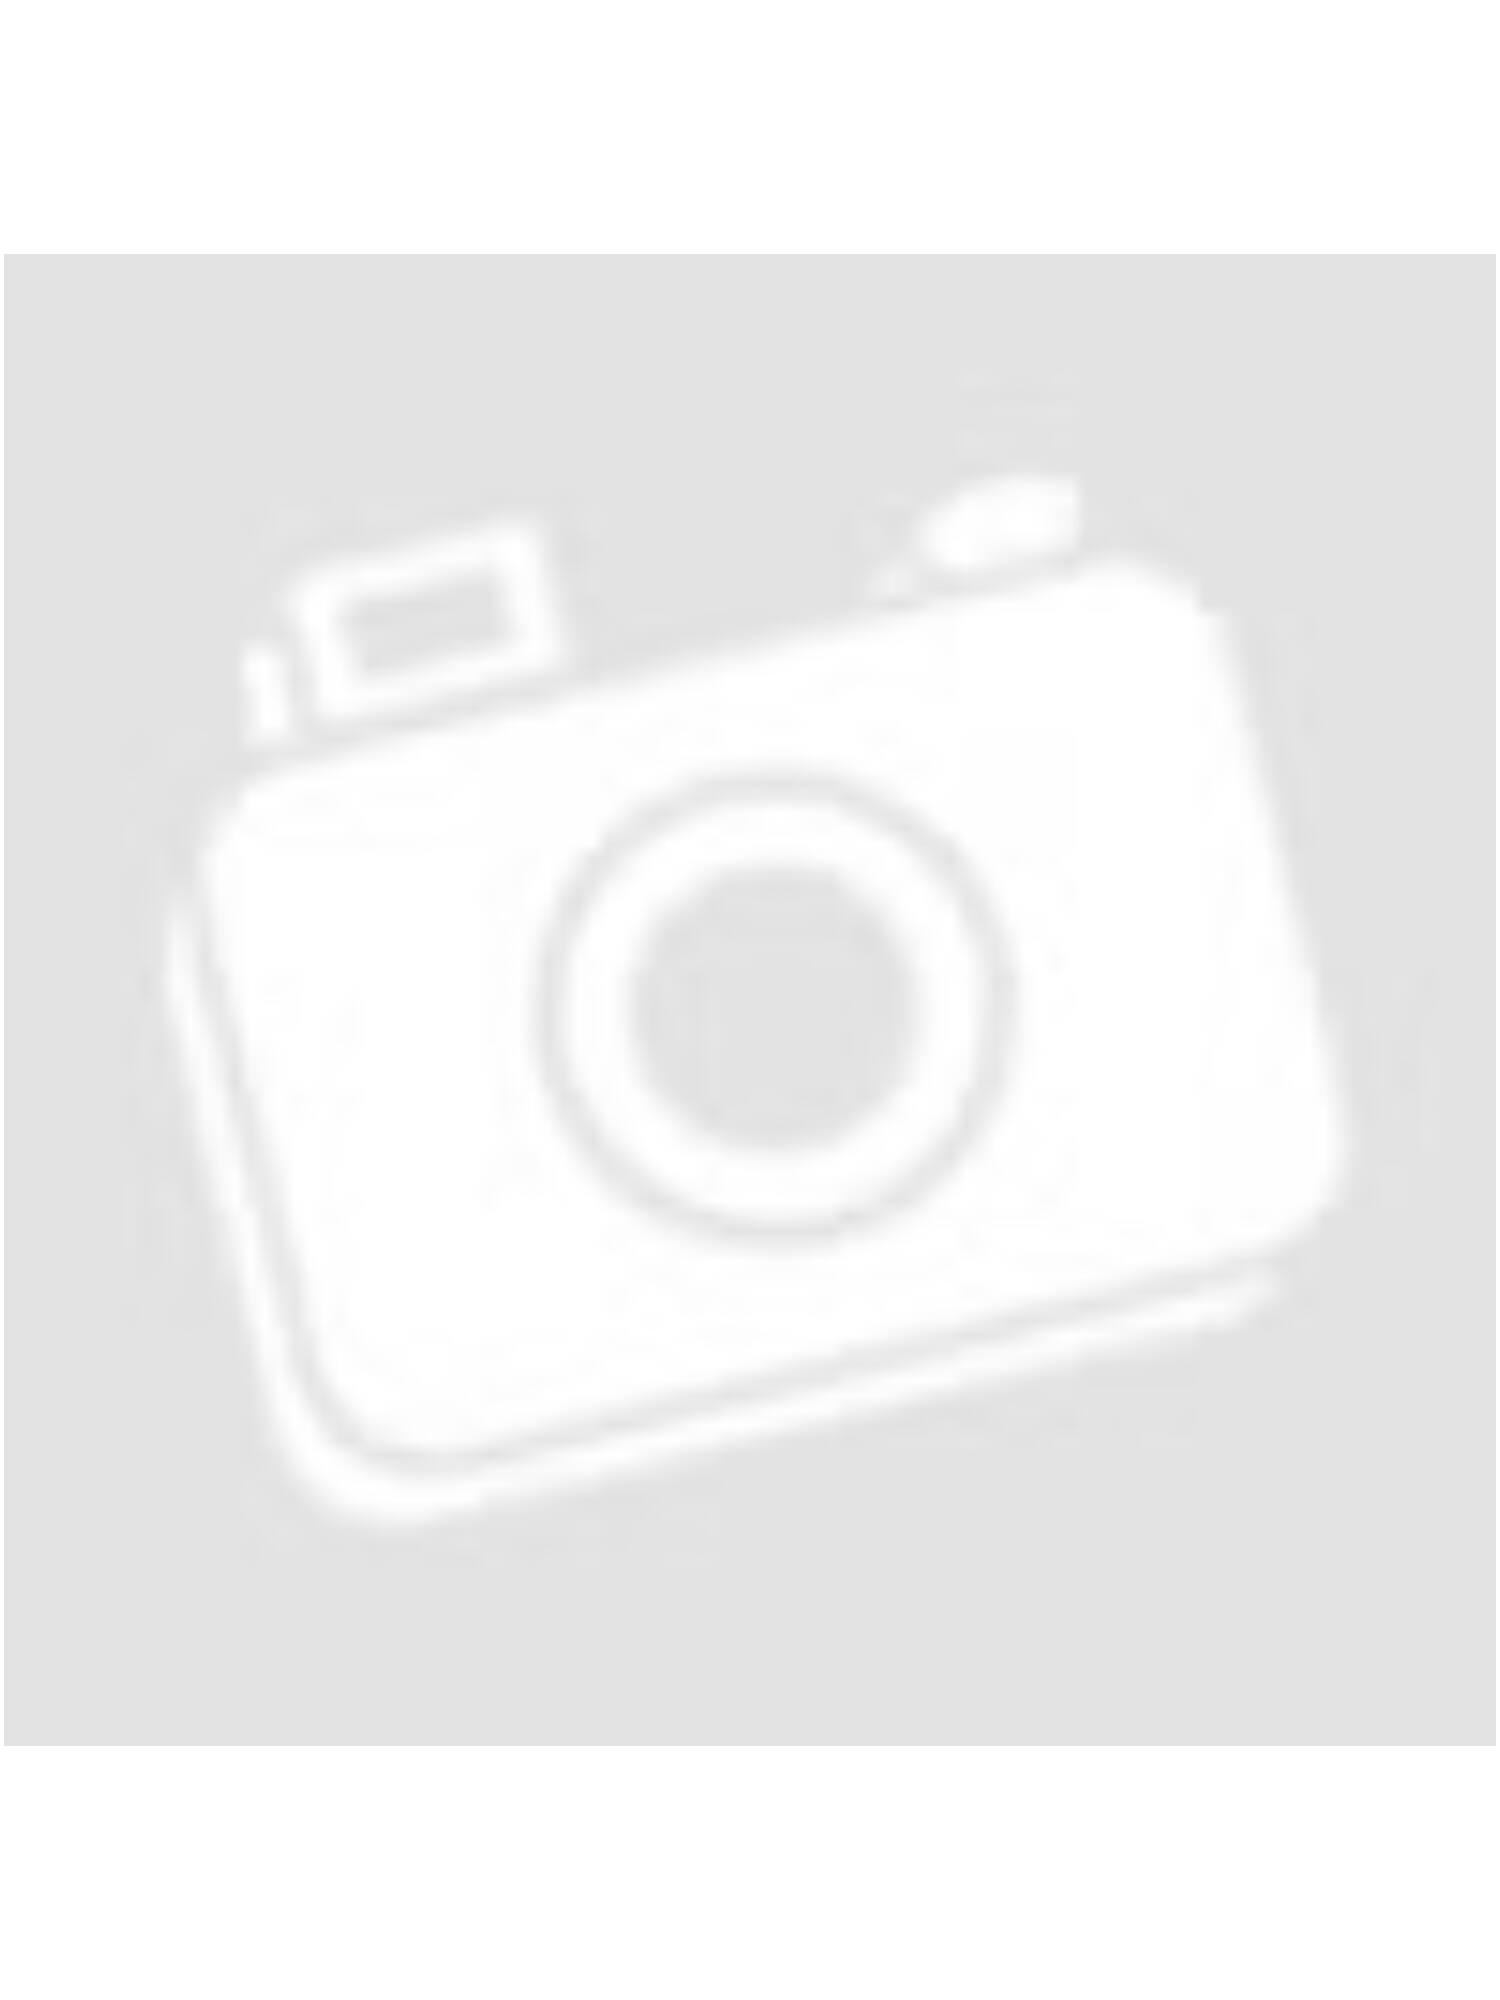 b7608479bf Motoros kabát - Kabátok, Dzsekik